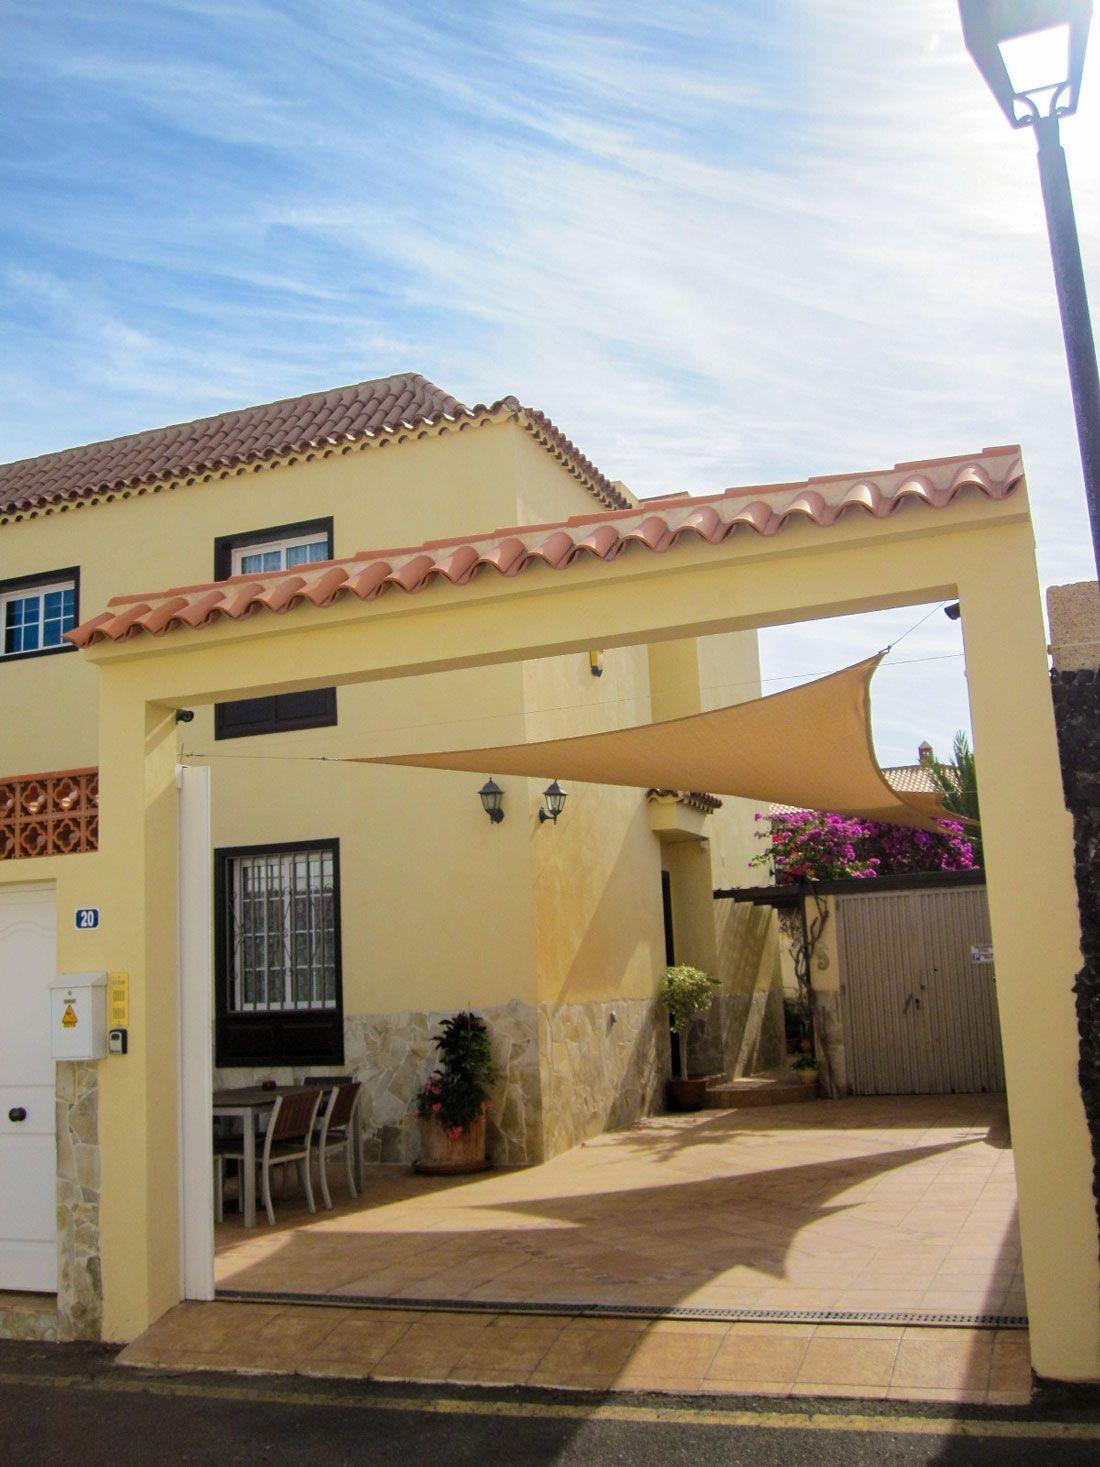 Villa in Costa del Silencio, Costa del Silencio, for sale